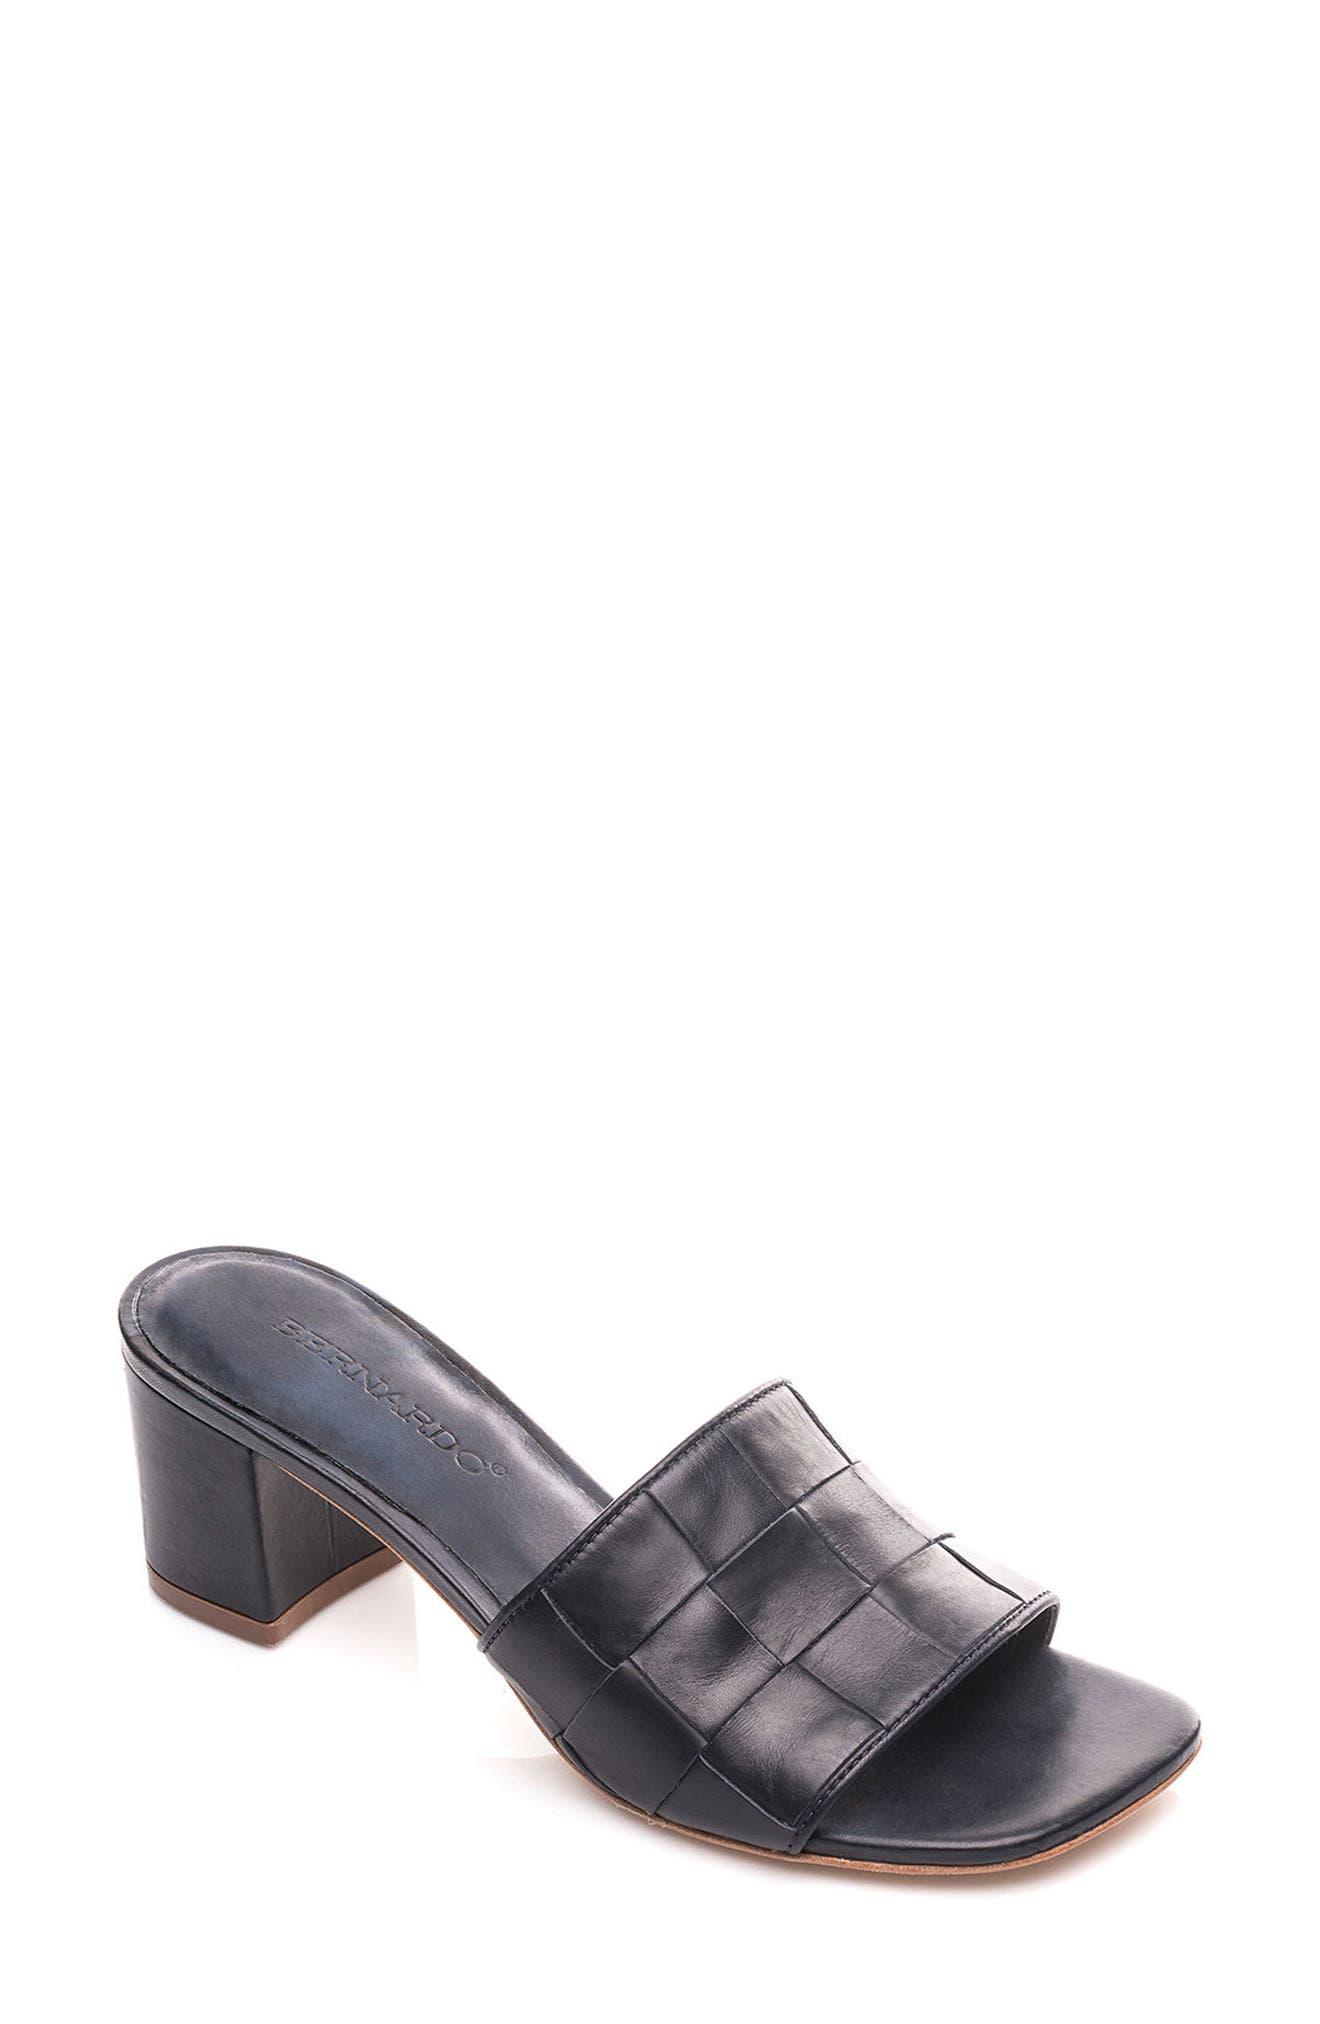 Alternate Image 1 Selected - Bernardo Bridget Block Heel Sandal (Women)